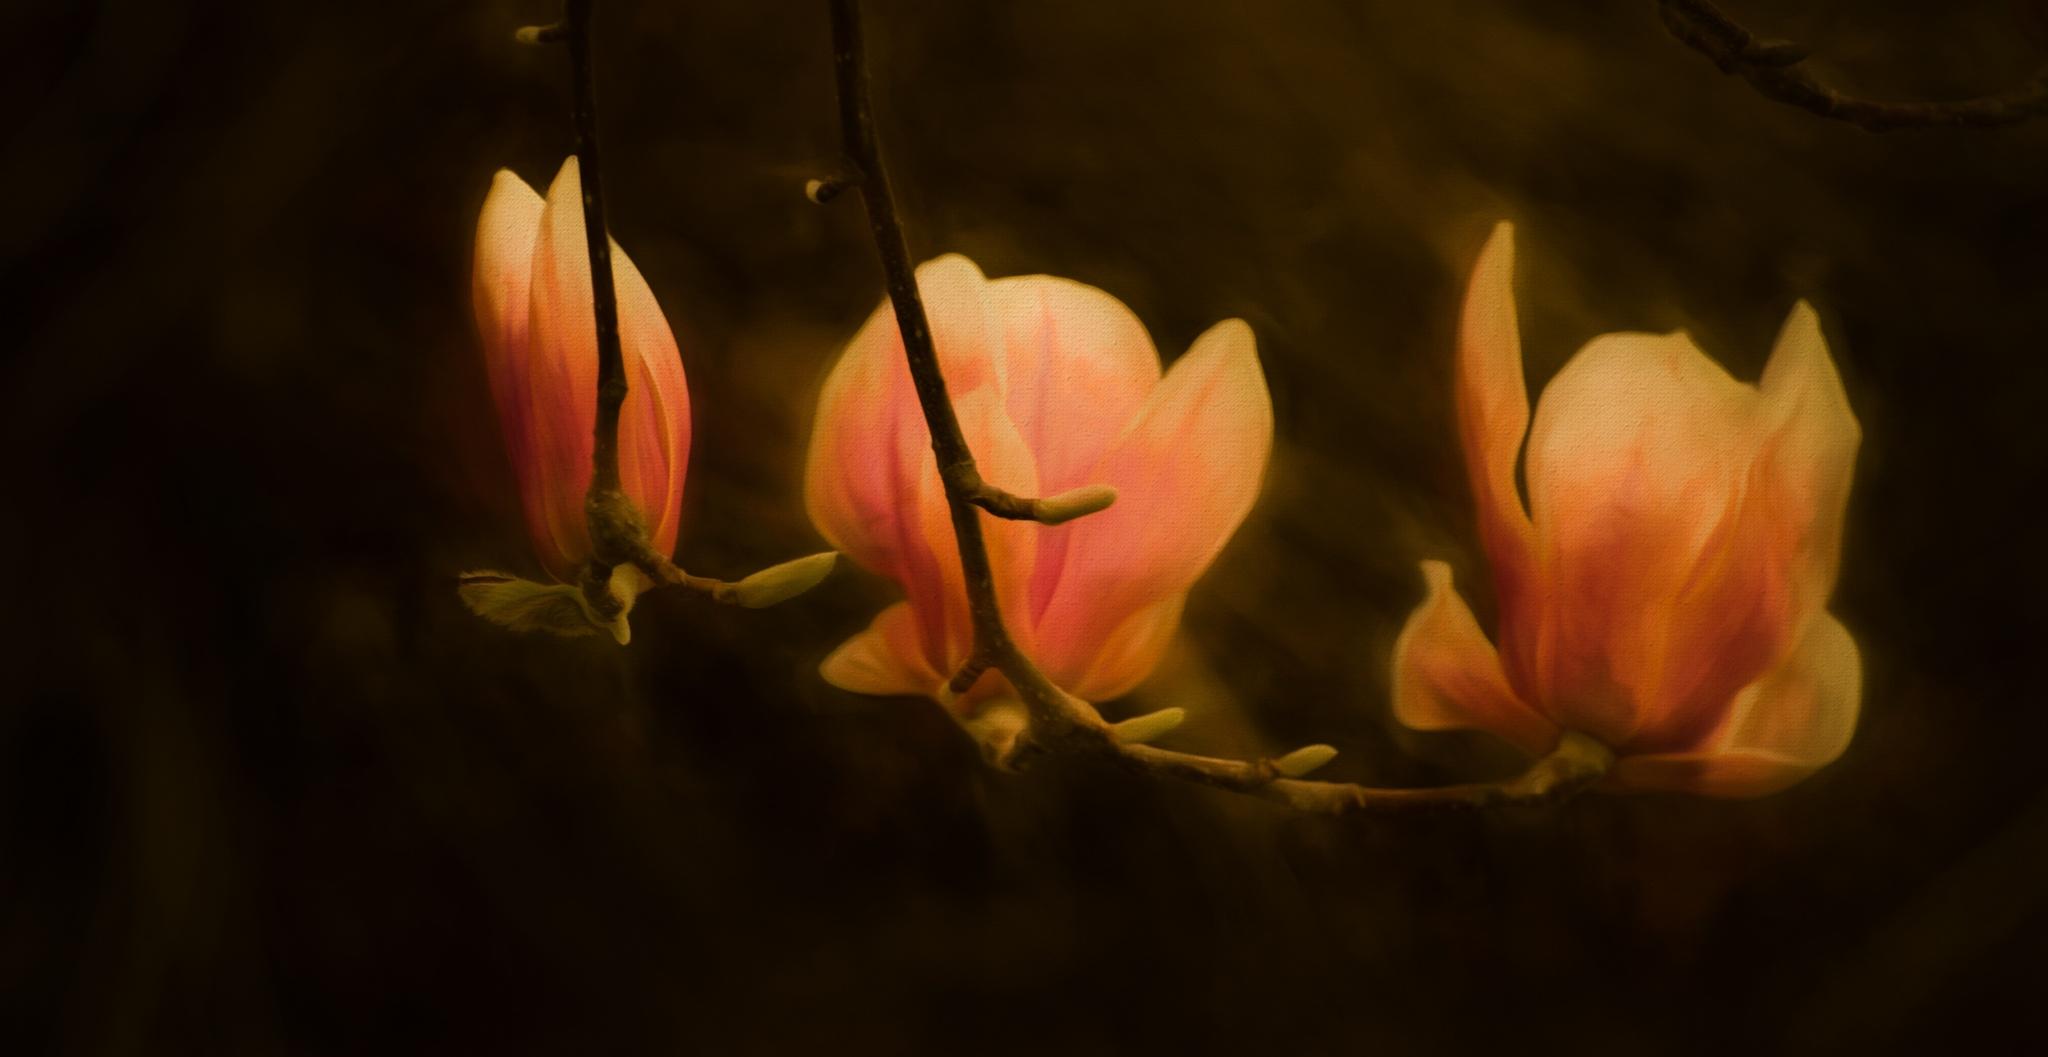 Magnolia Dreams 432 by JohnEllingson